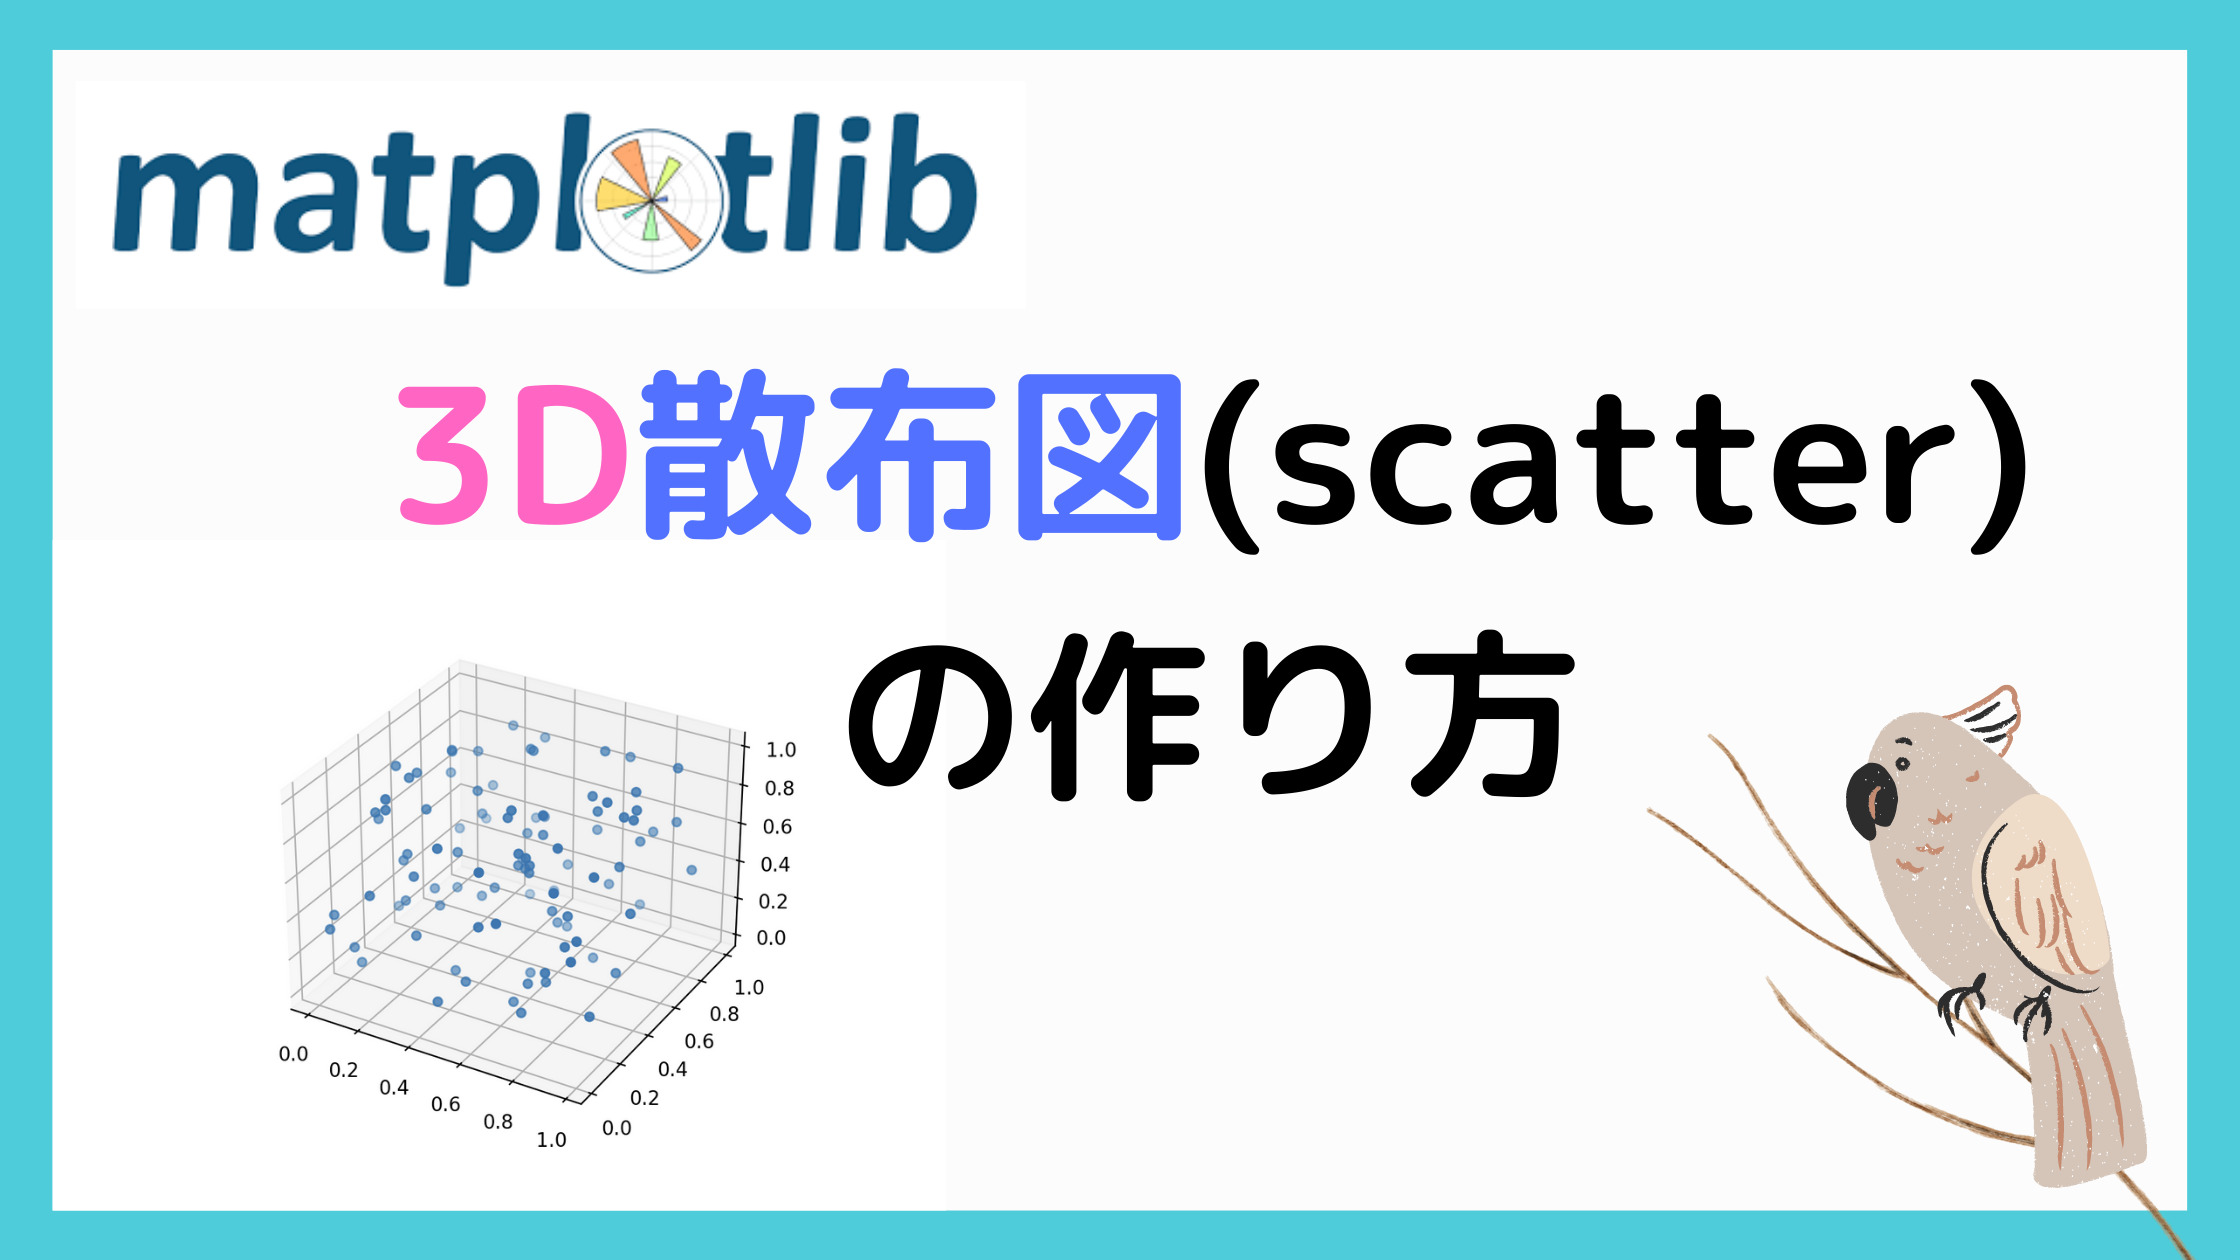 matplotlibの3d散布図の記事のアイキャッチ